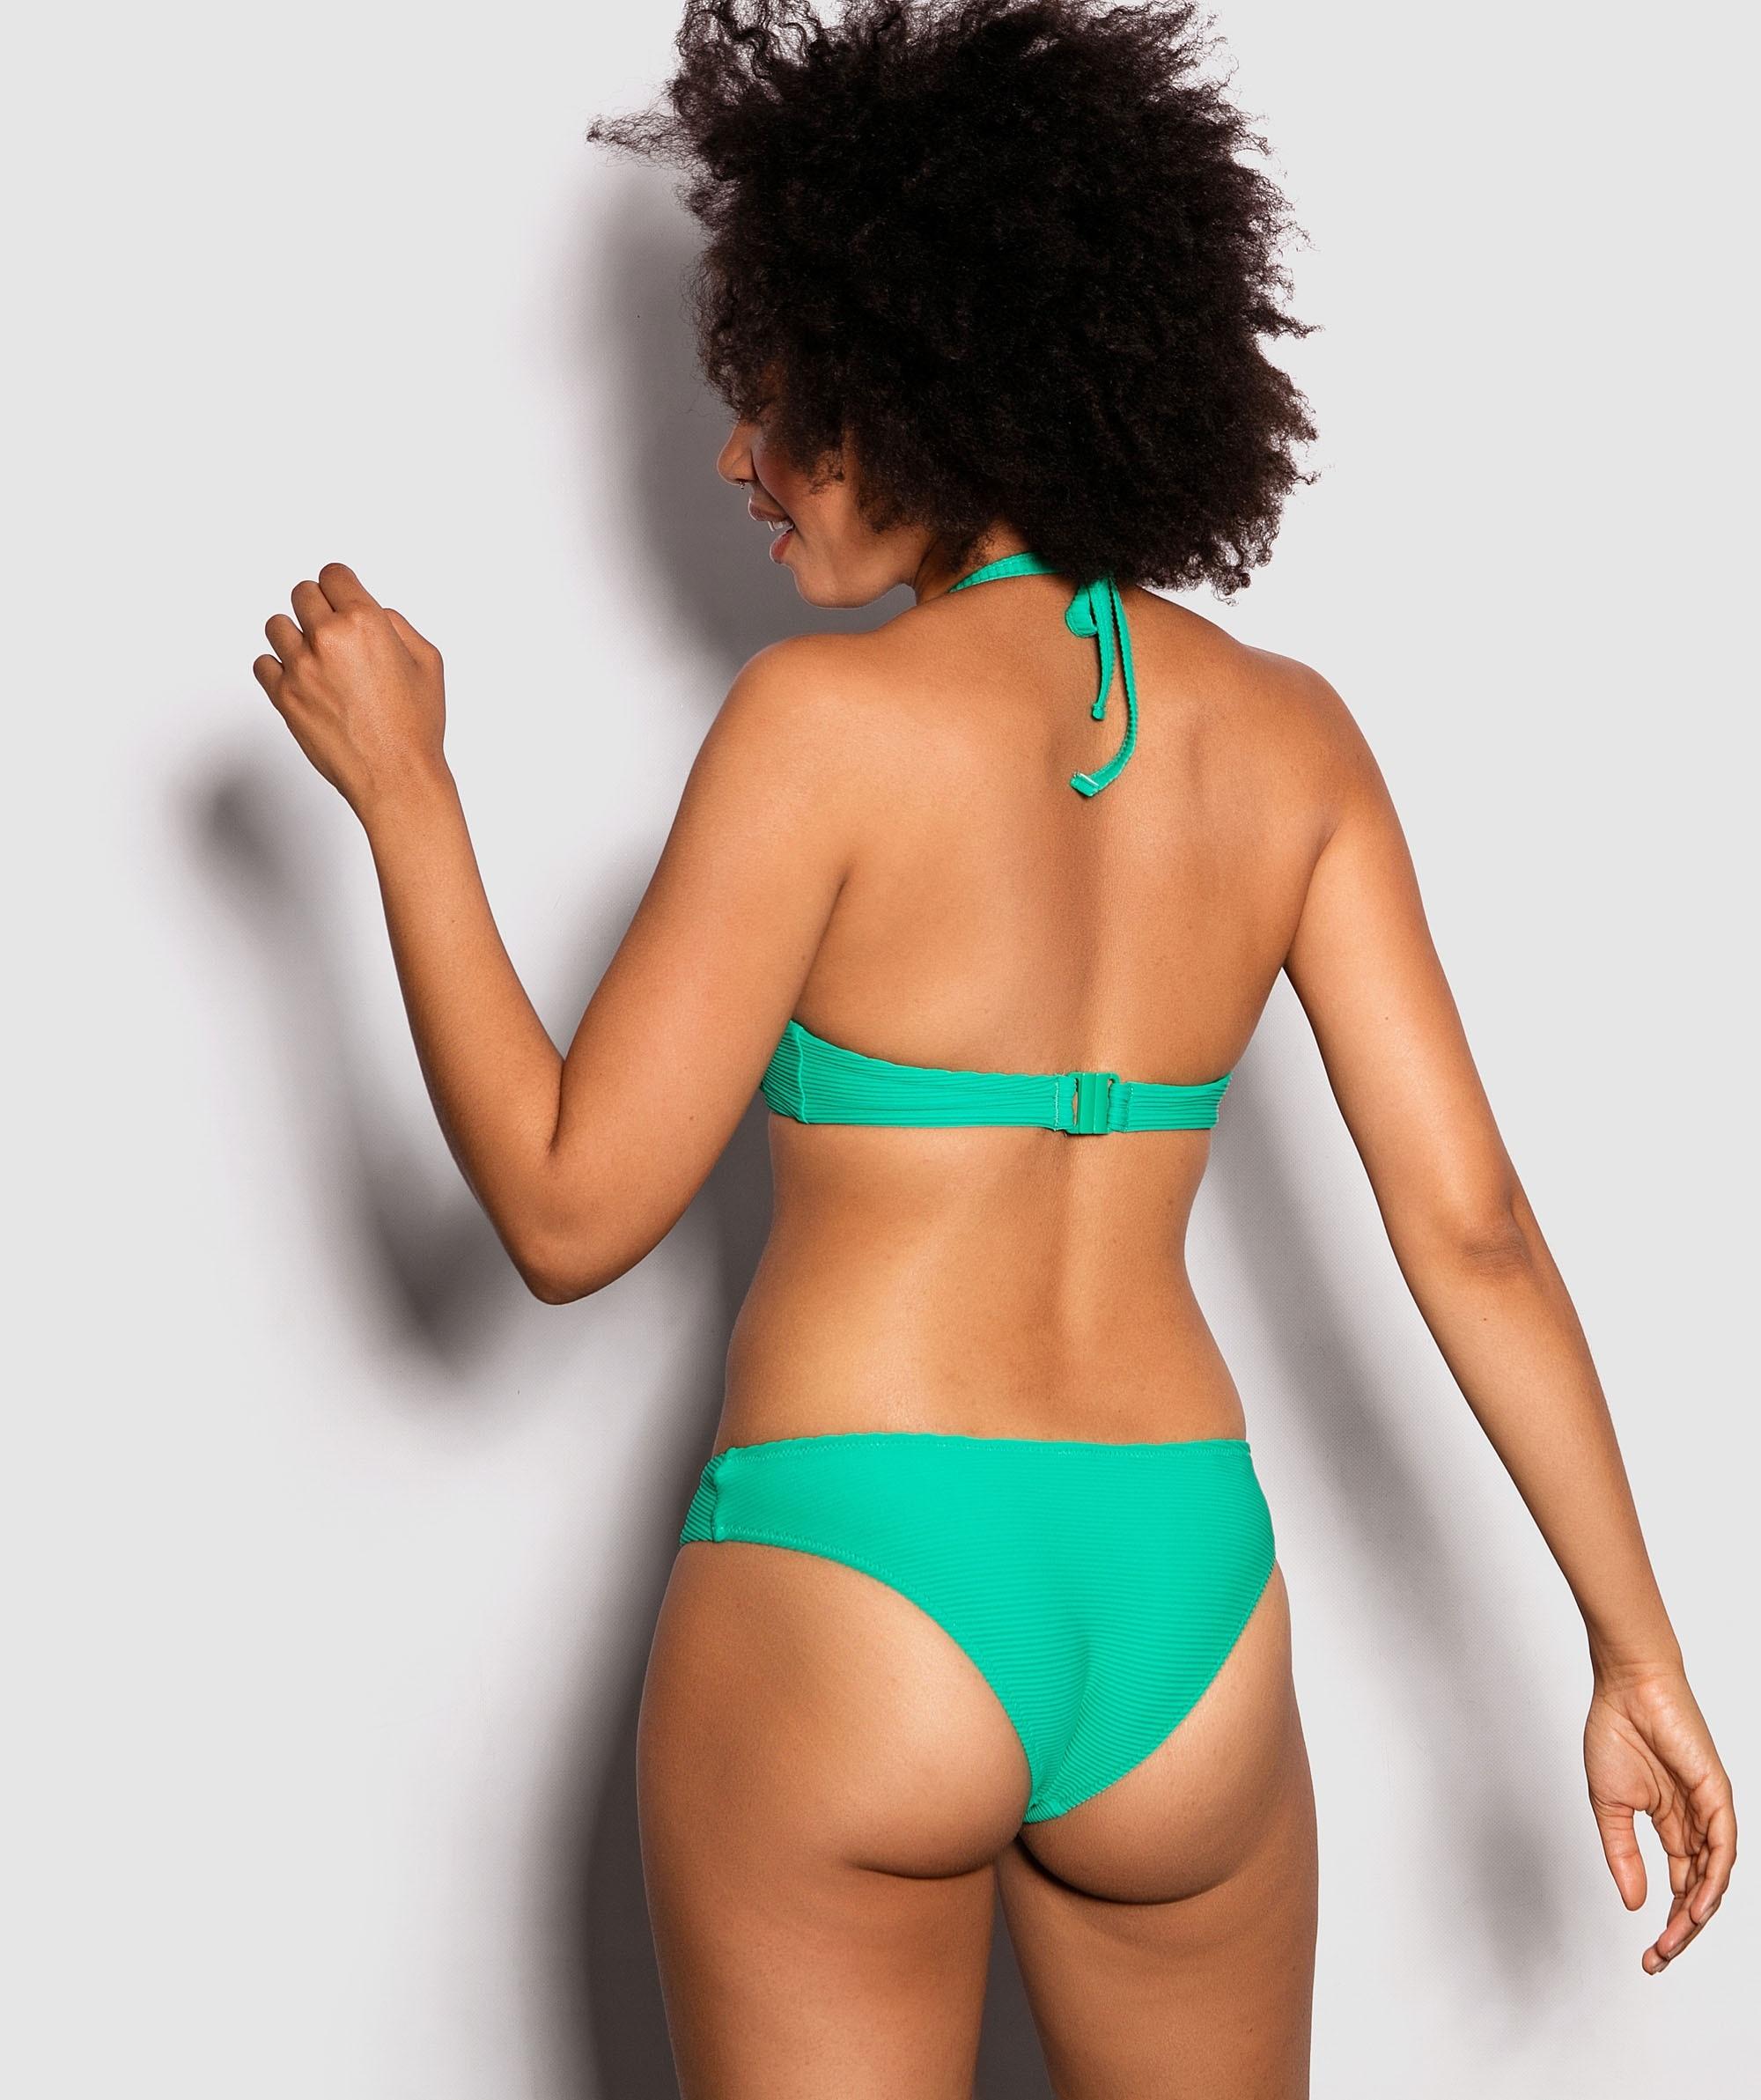 Havana Plain Marla Brazilian Swim Pants - Green